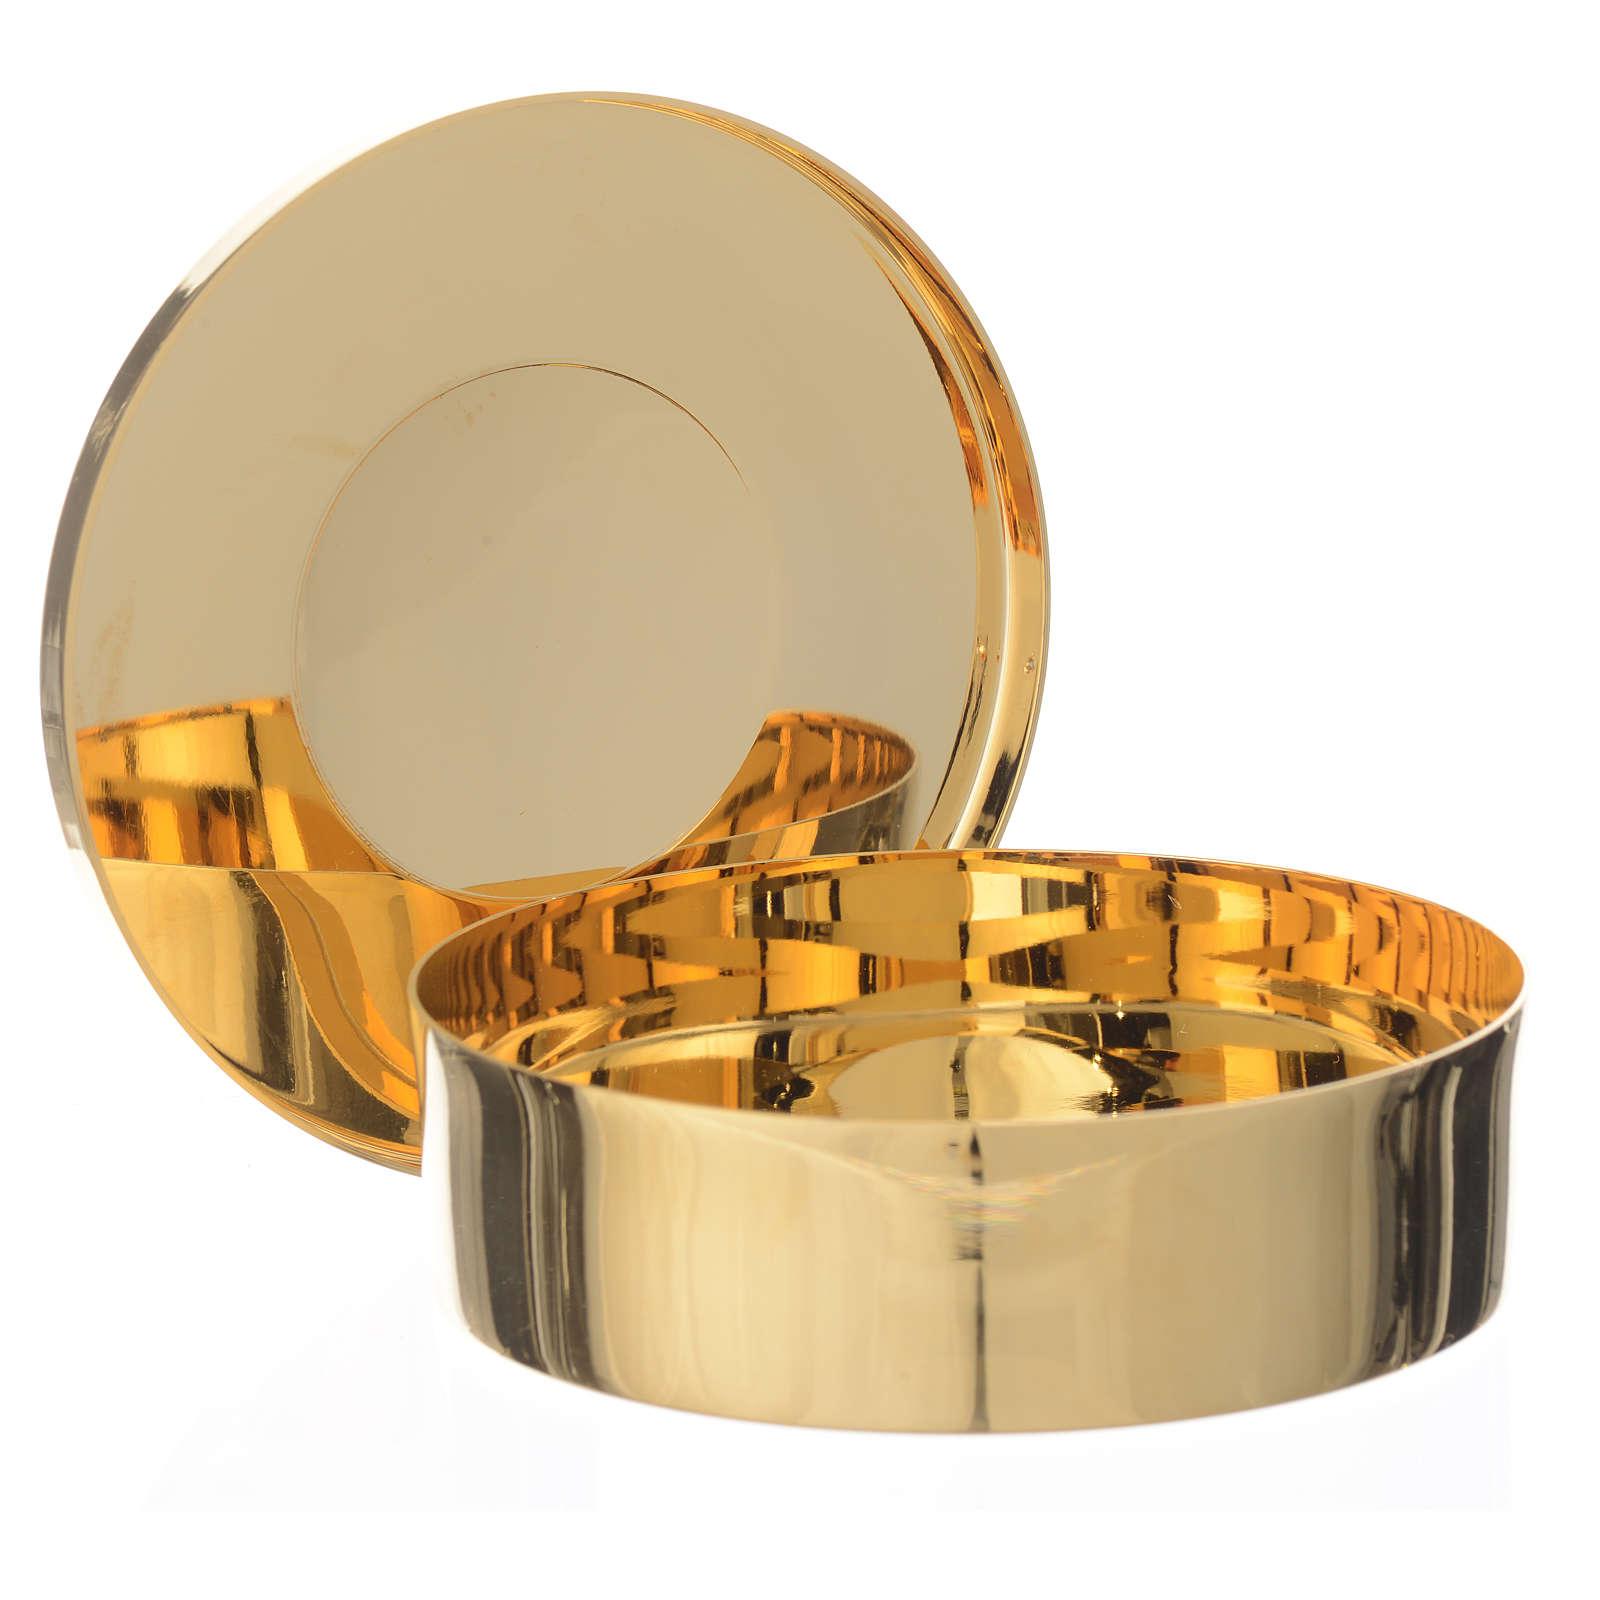 Teca dorata ottone incisione IHS cm 9 diametro 3